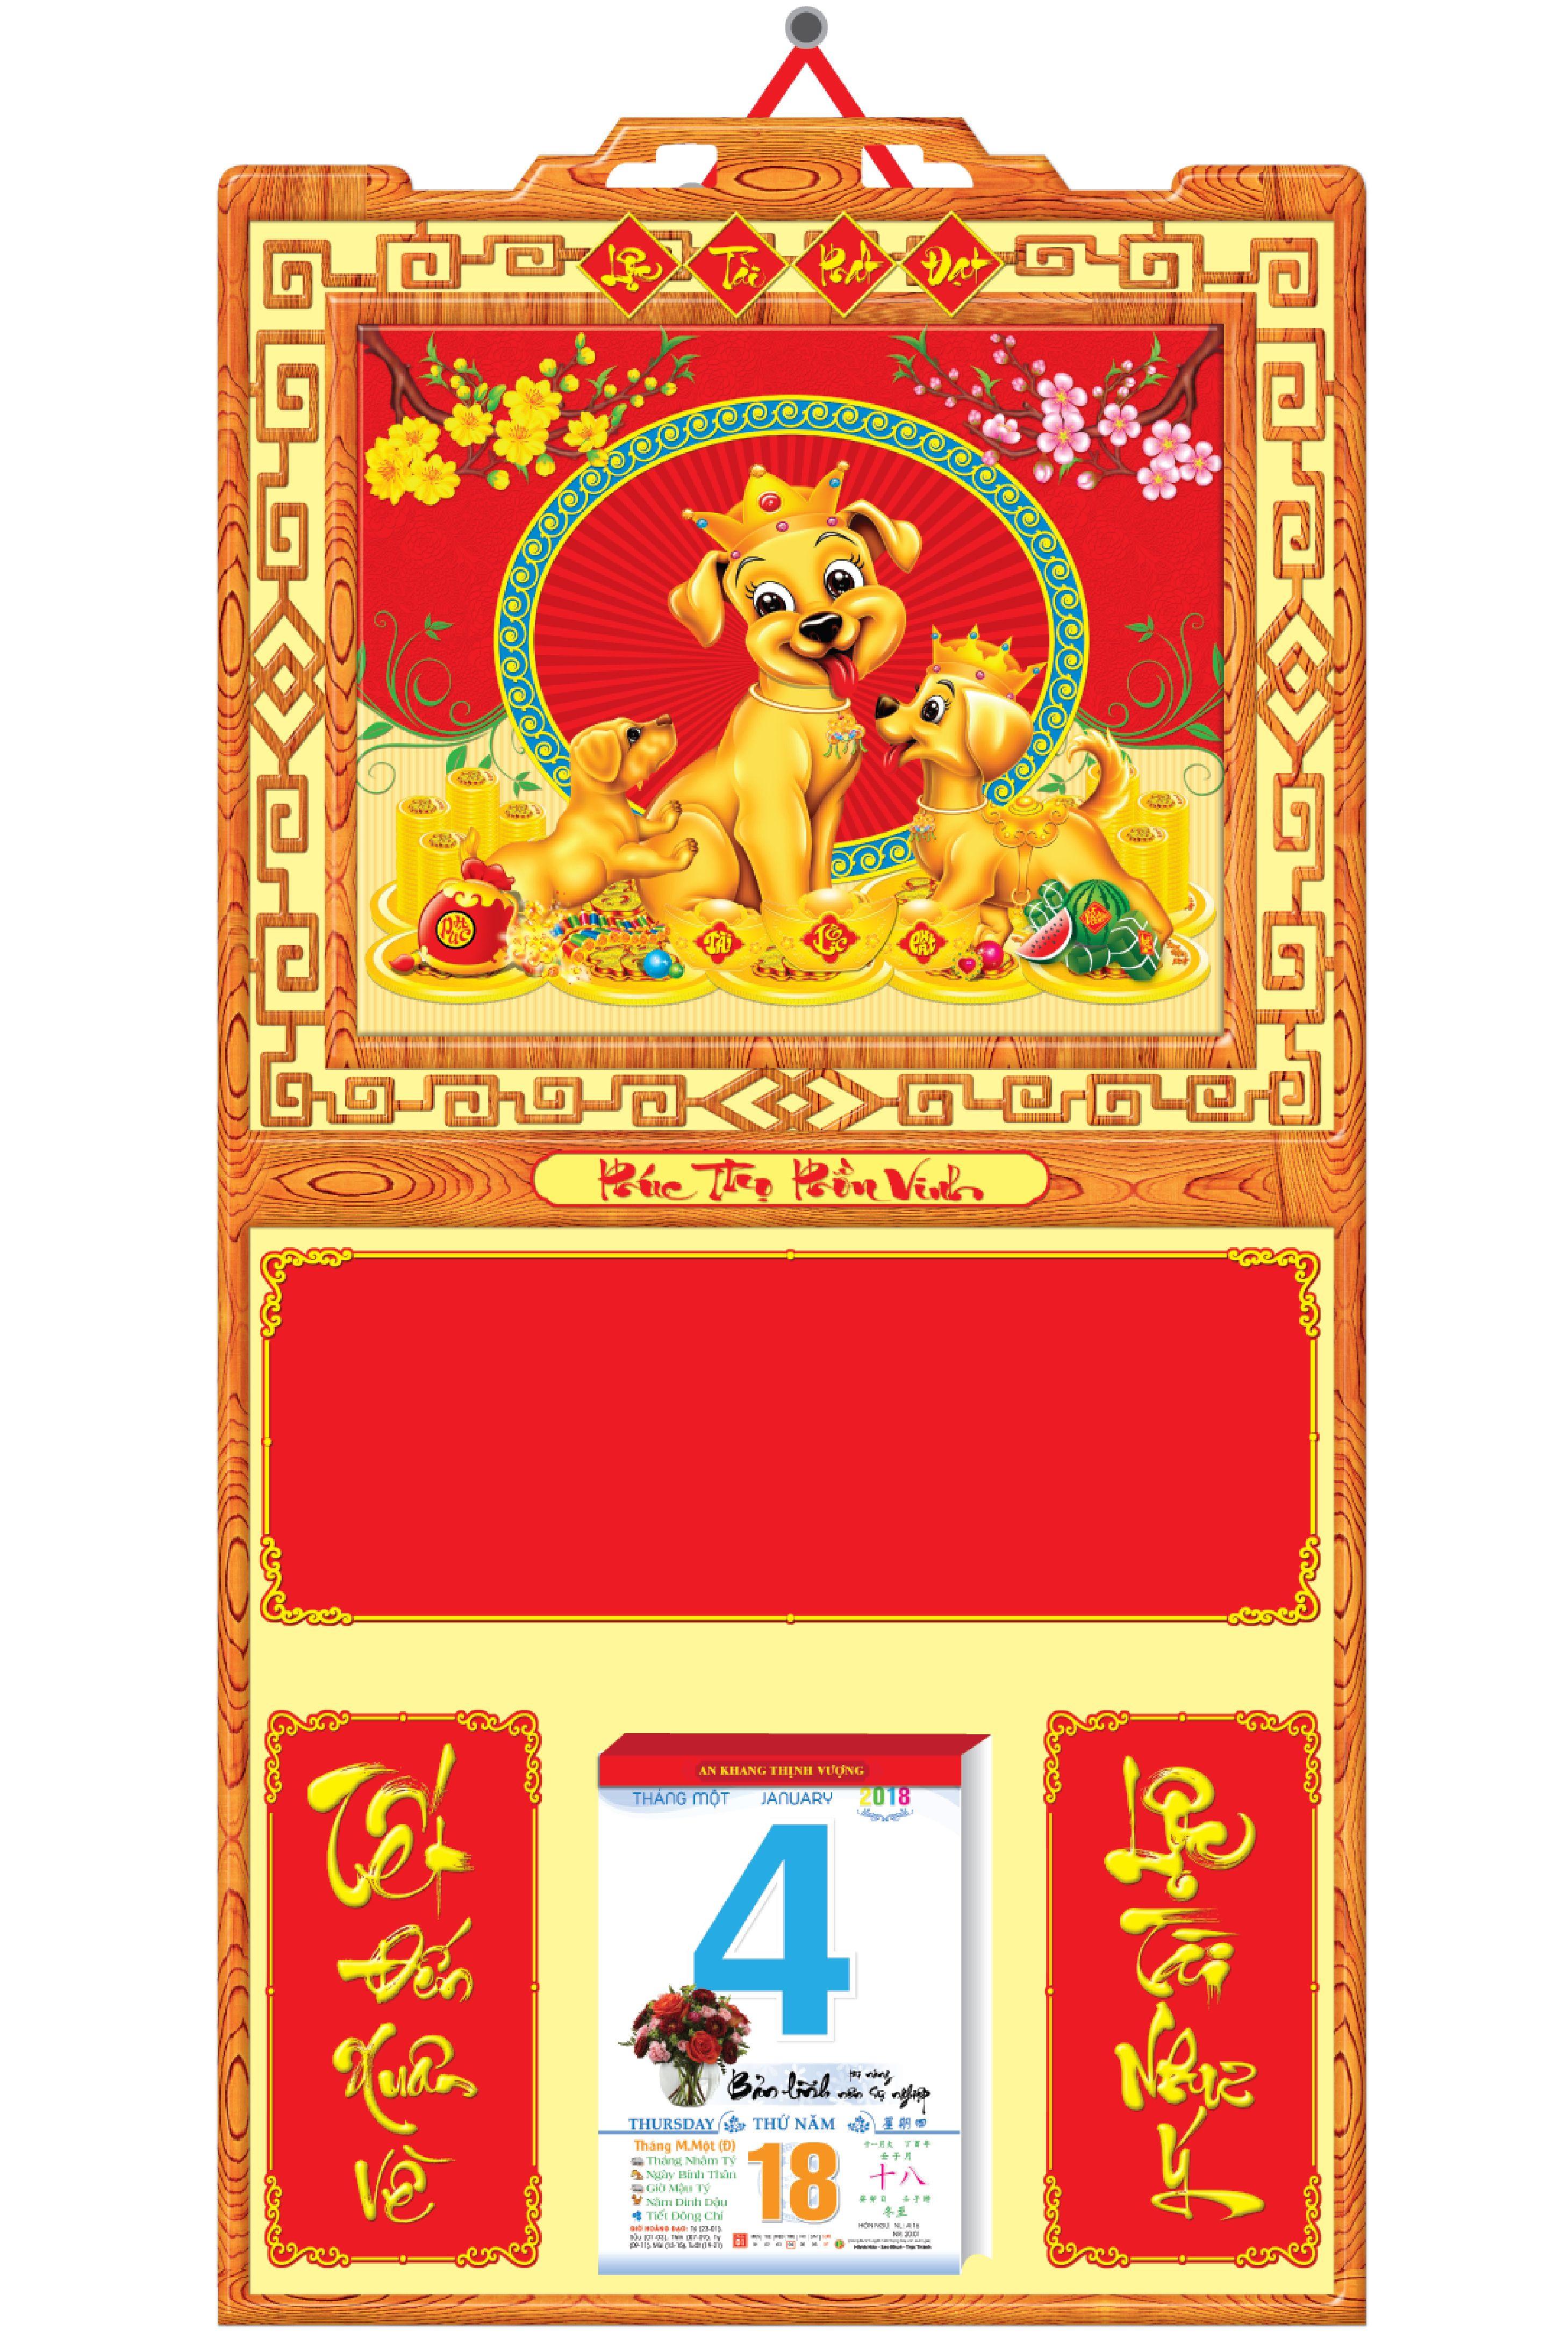 KV202 - Bìa 2018 Lịch Gấp Giữa Bế Nổi (37 x 68cm) - Xuân Mậu Tuất A - EBOOK/PDF/PRC/EPUB